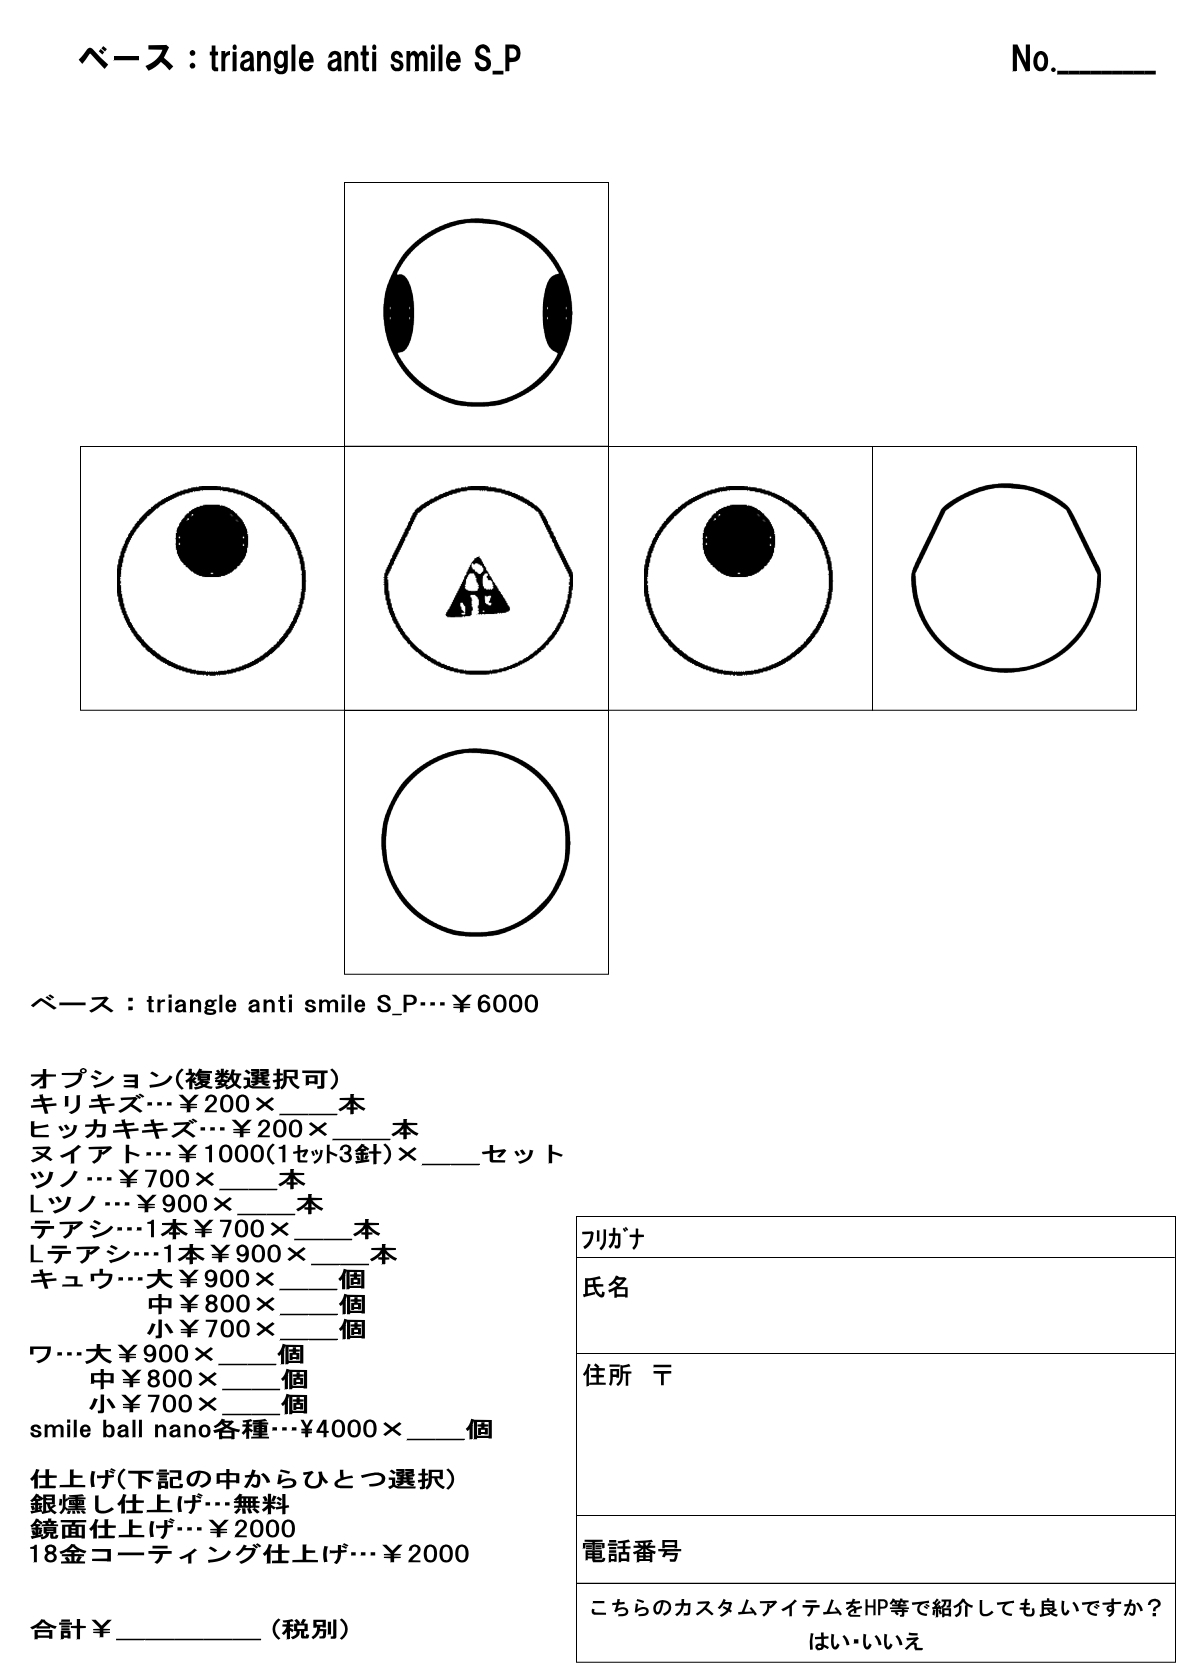 12/2smile_mammyカスタム受注イベント詳細。_d0014014_23163177.jpg